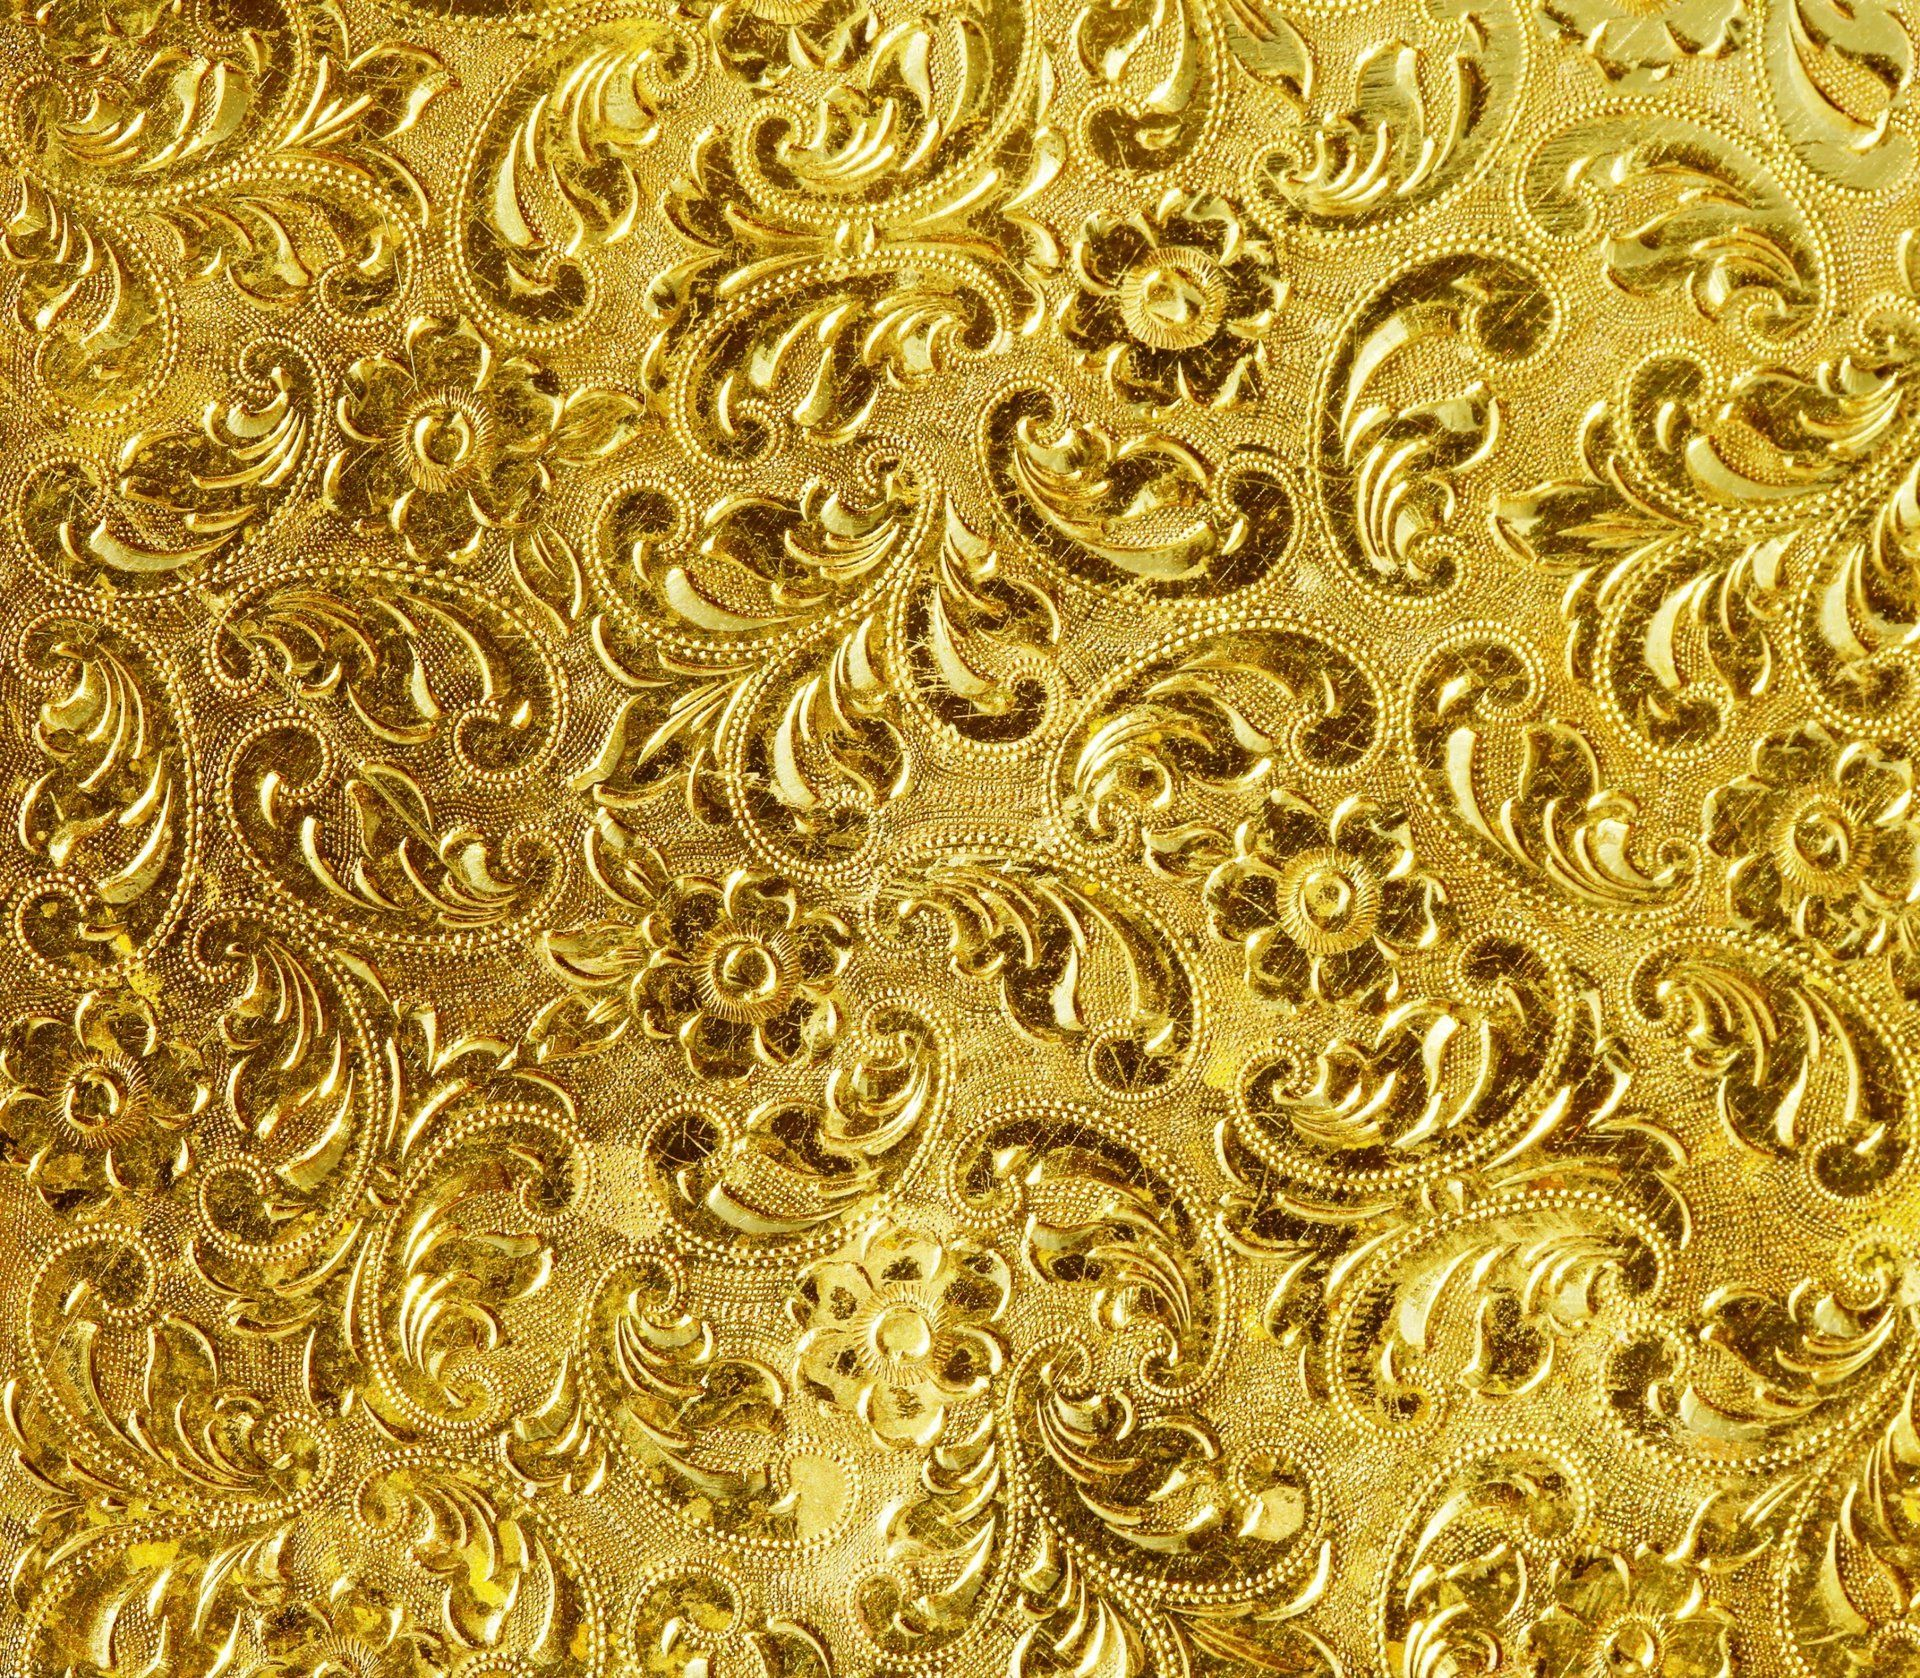 golden pattern background gold pattern background textures ...